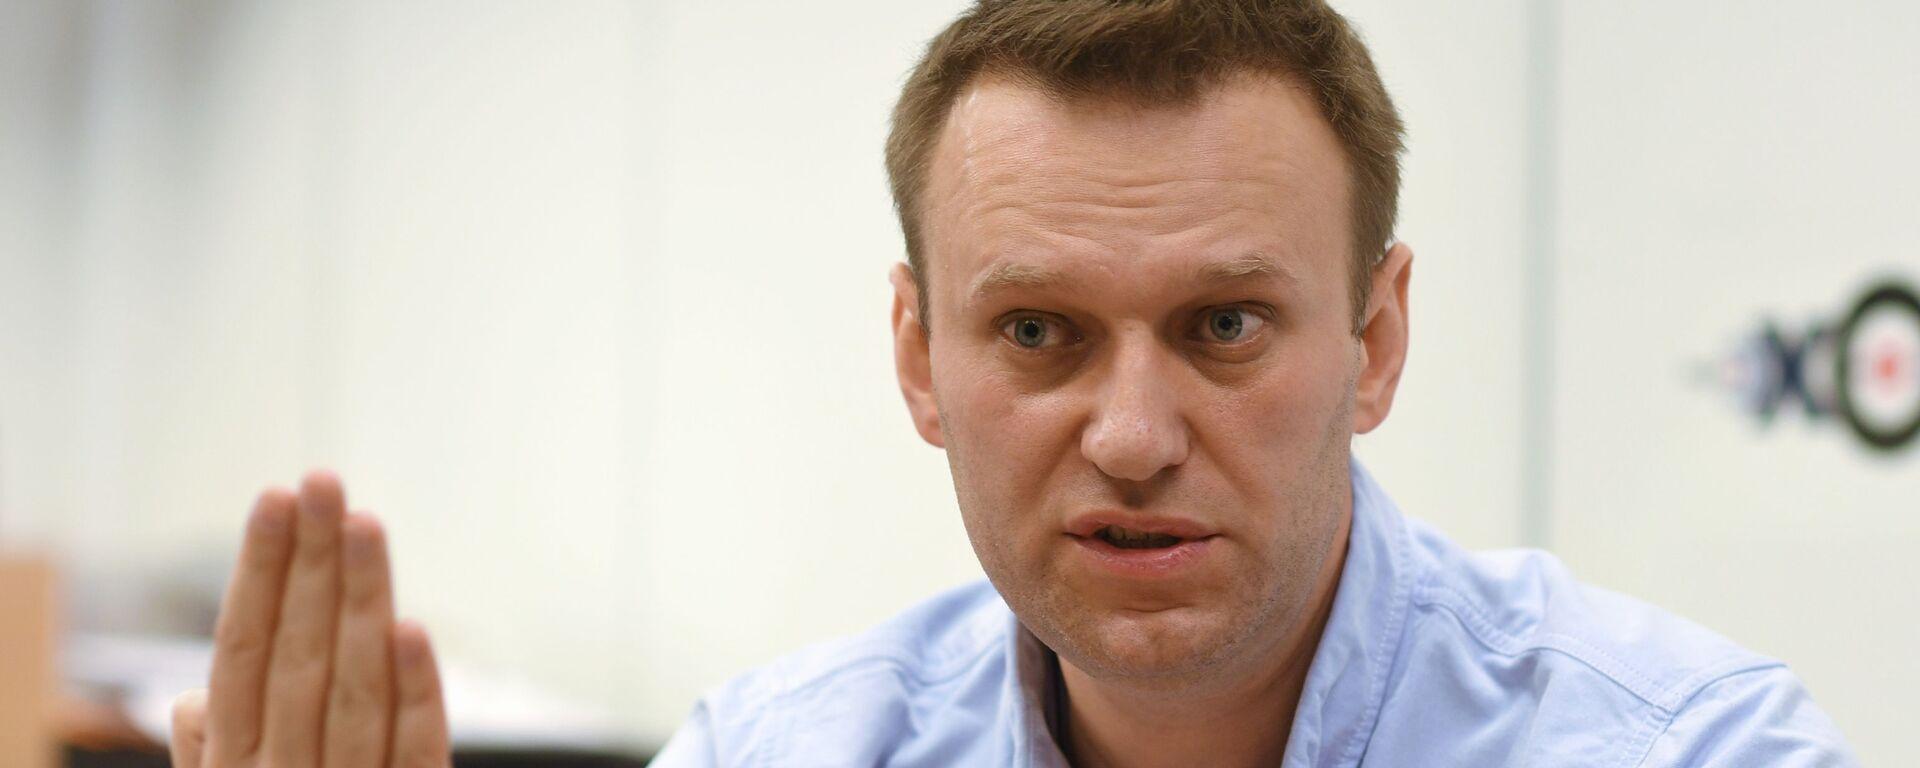 Alexéi Navalni, activista opositor ruso - Sputnik Mundo, 1920, 25.05.2021